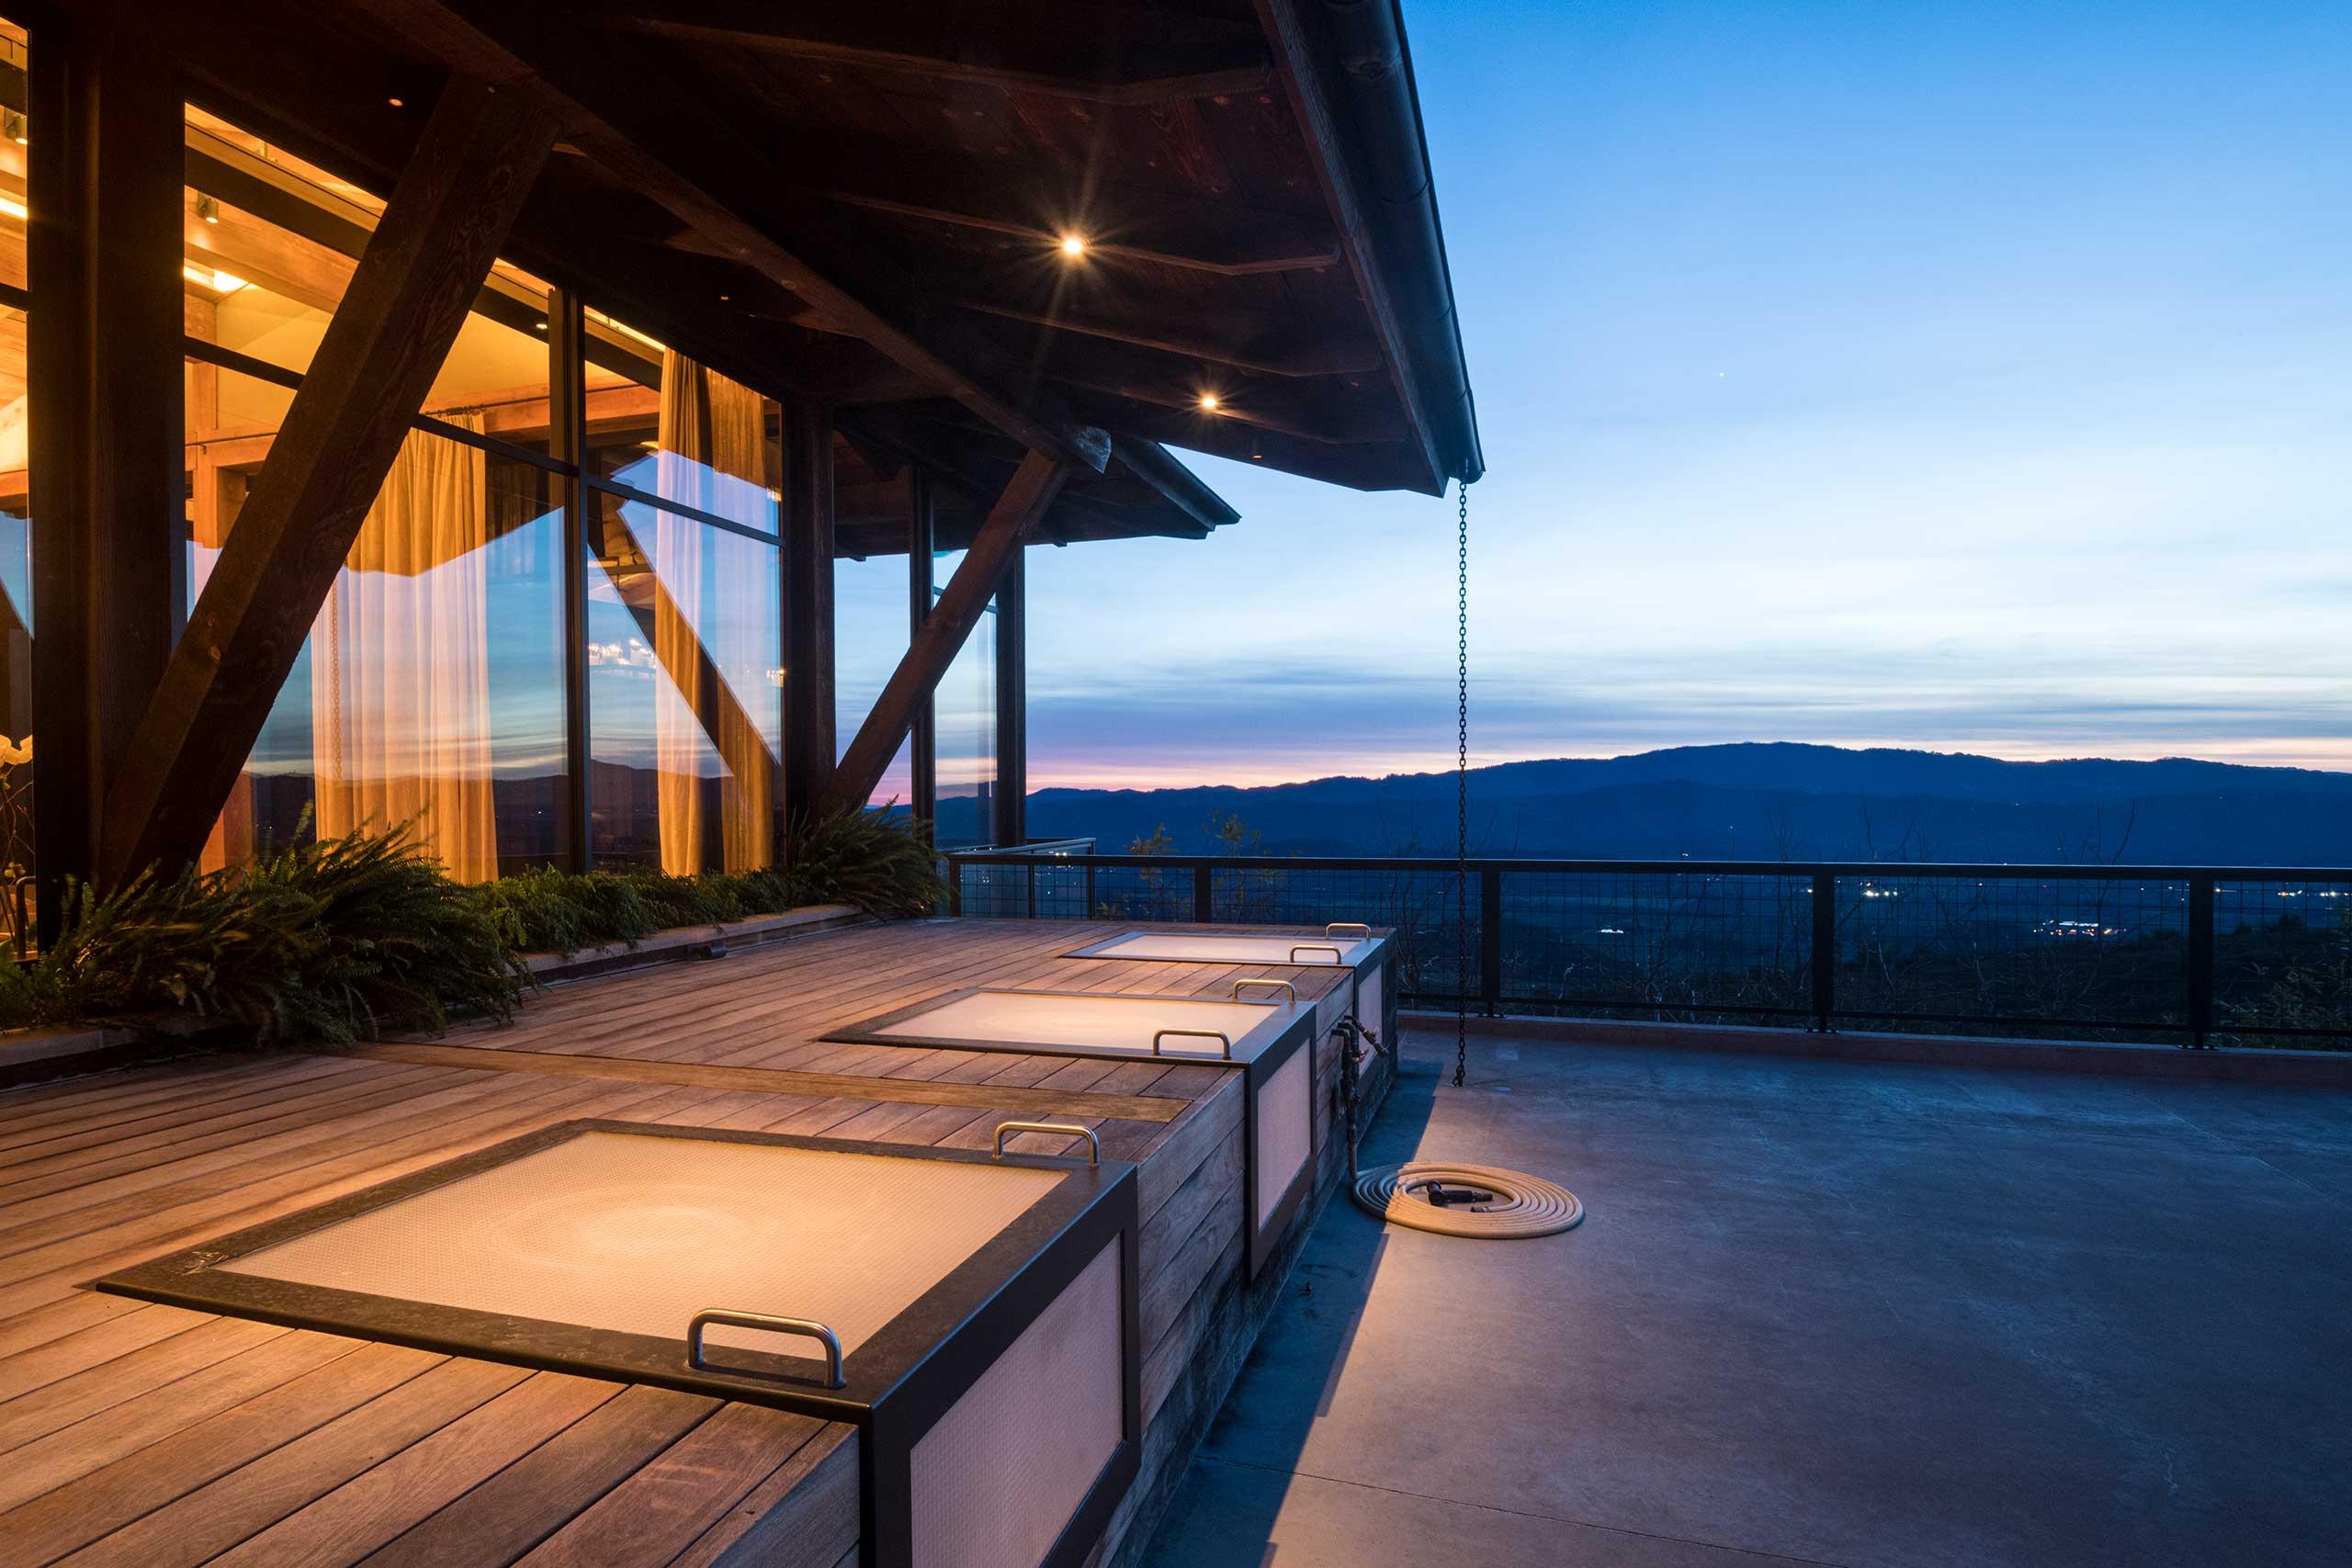 Elemental & Harmonious Architecture